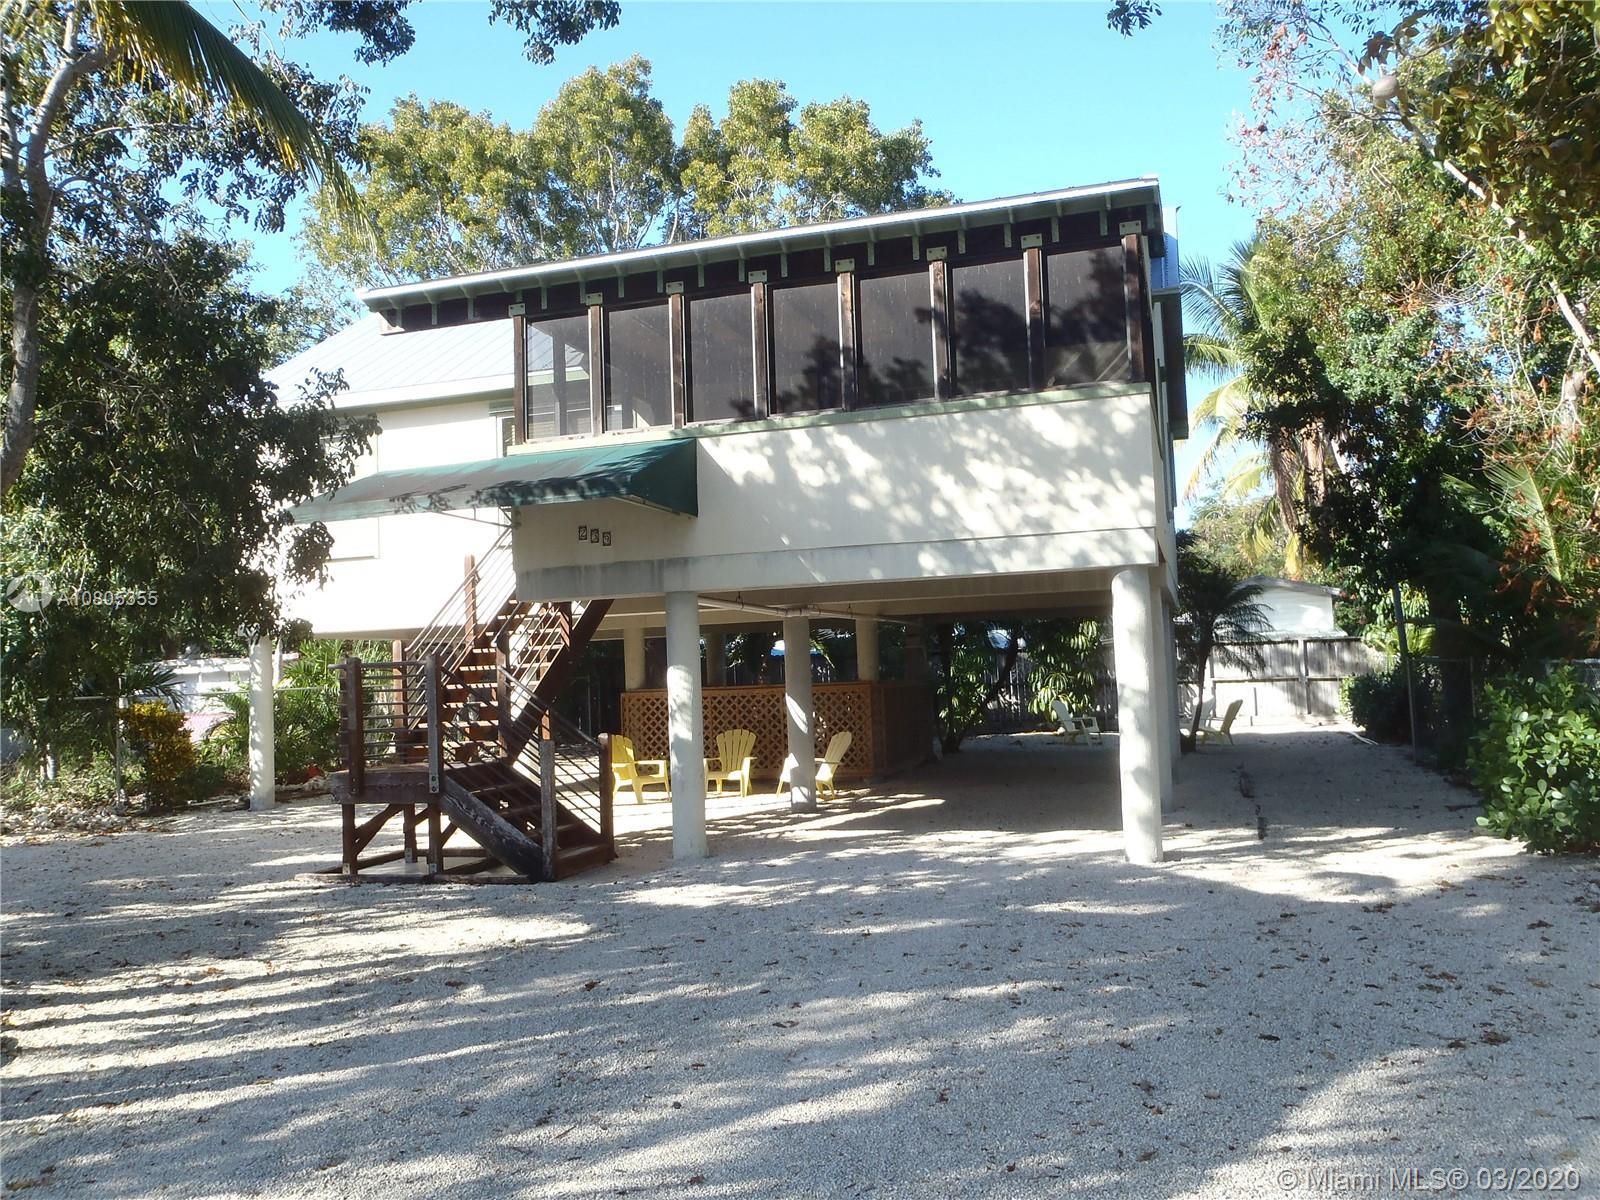 Key Largo Mobile Homesites Real Estate Listings Main Image